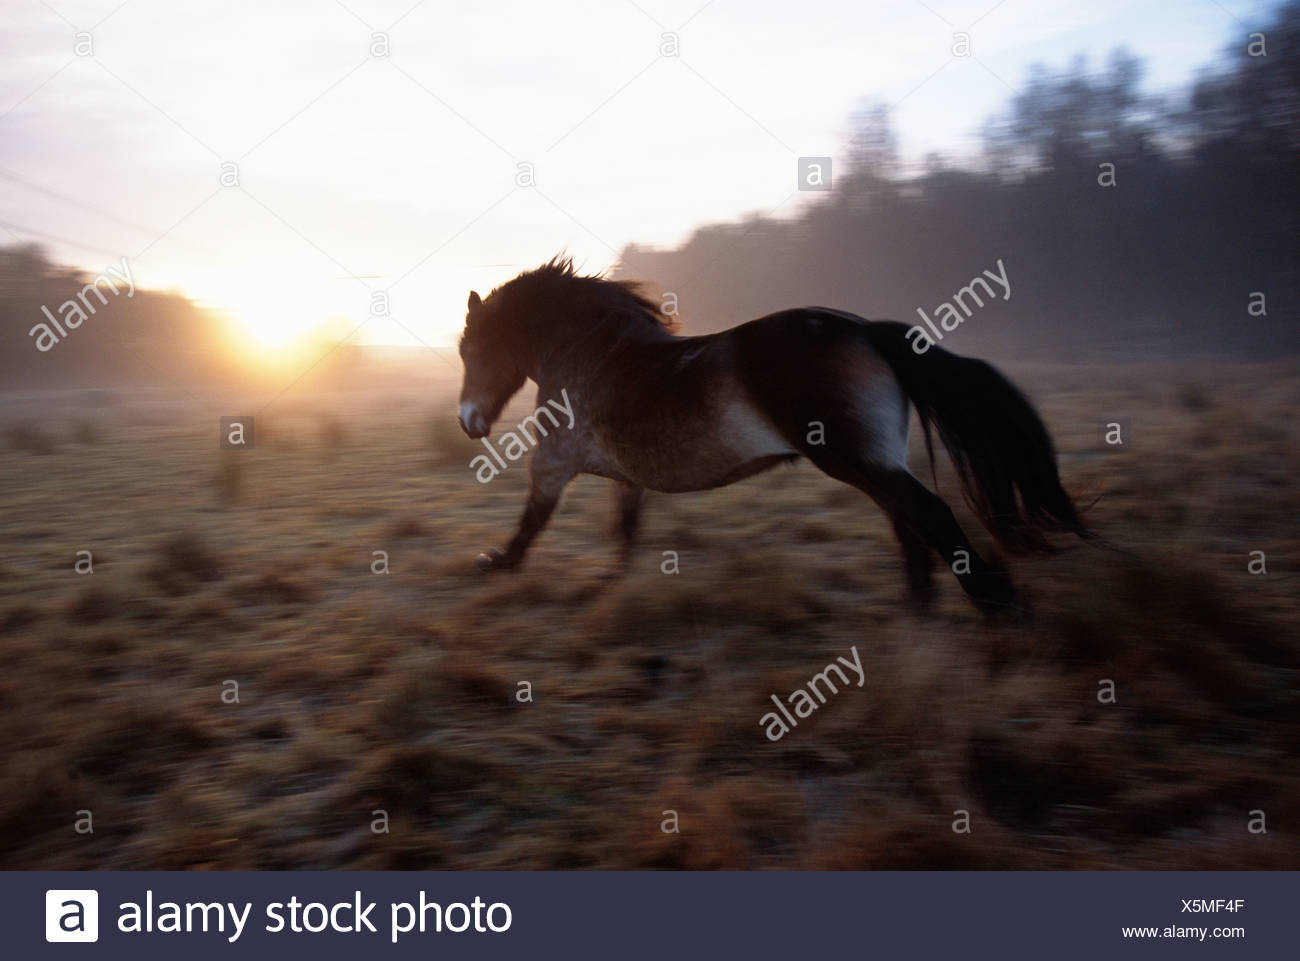 A north Swedish horse, Gothenburg, Sweden. - Stock Image